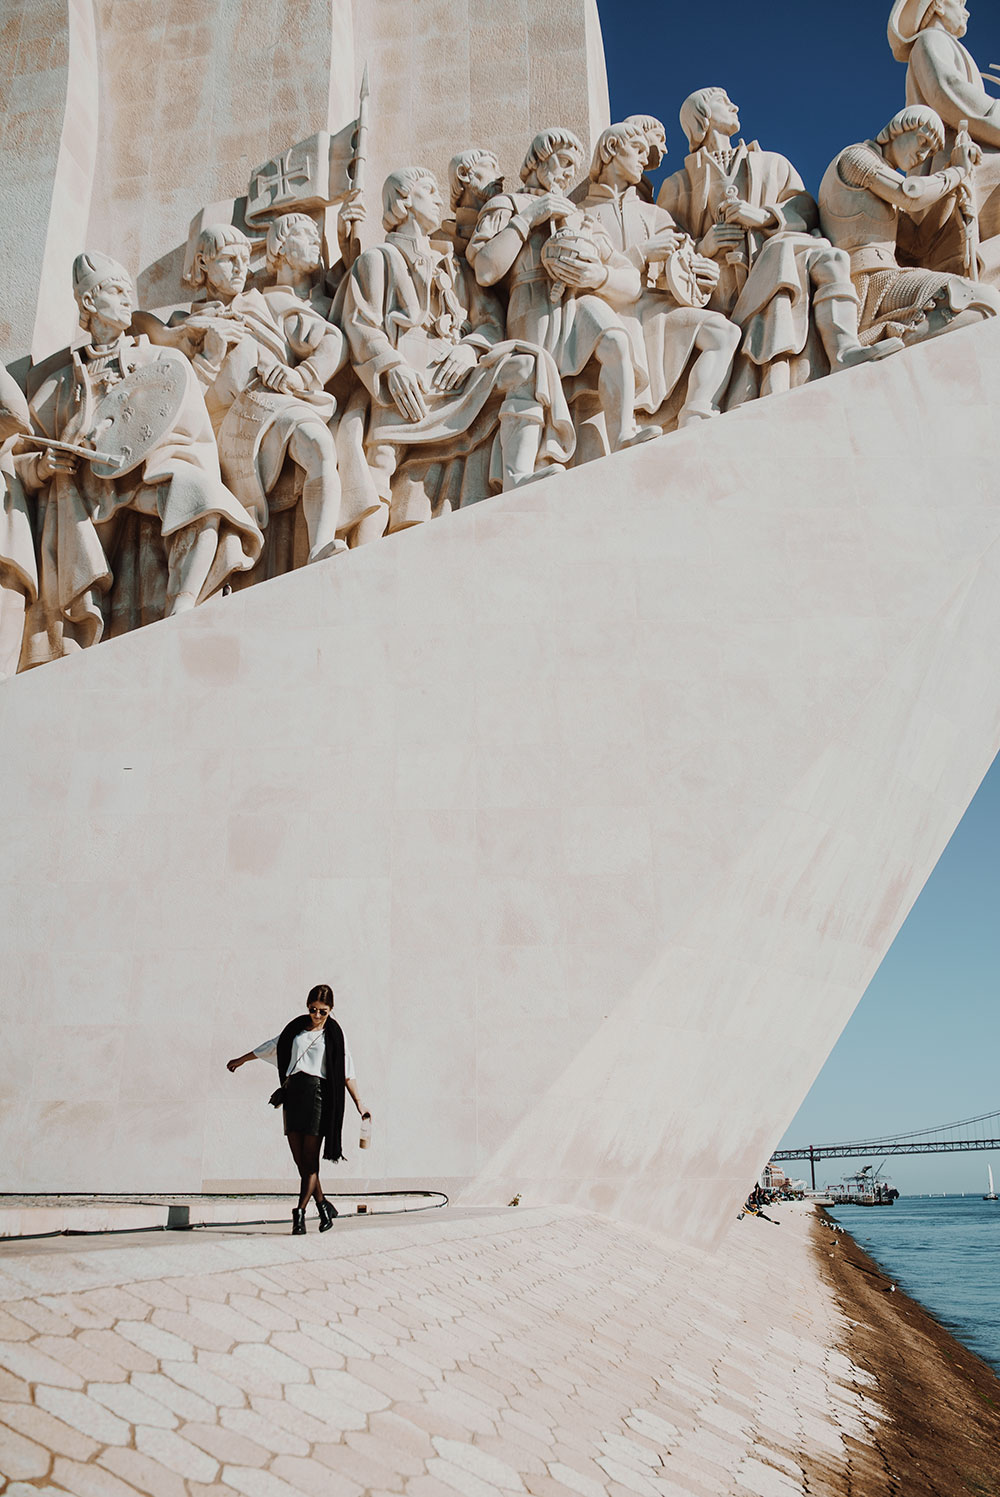 Lisbonne entre copines padrao dos descobrimentos